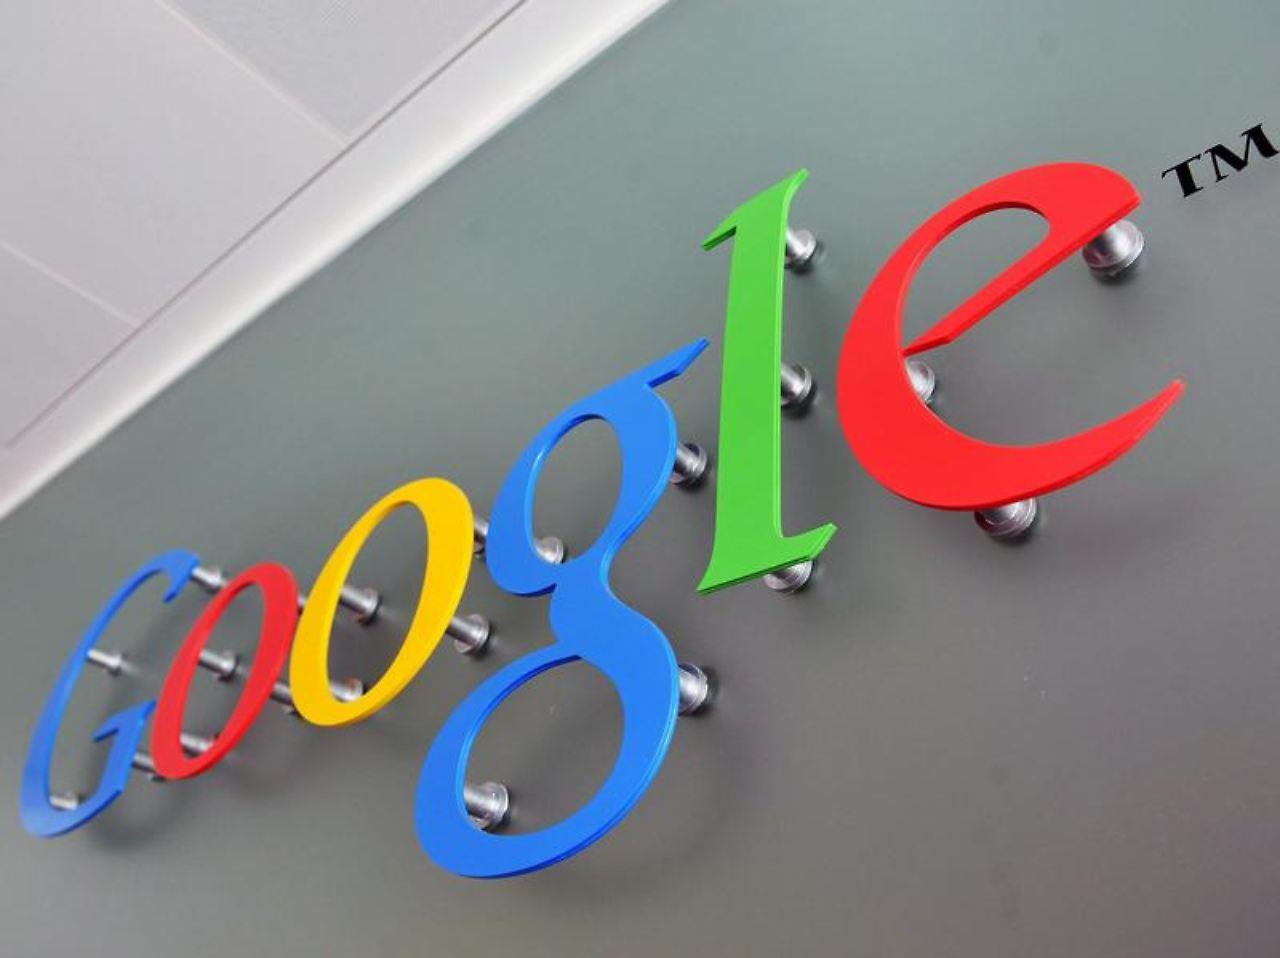 investitionen in deutschland google schafft hunderte jobs n. Black Bedroom Furniture Sets. Home Design Ideas